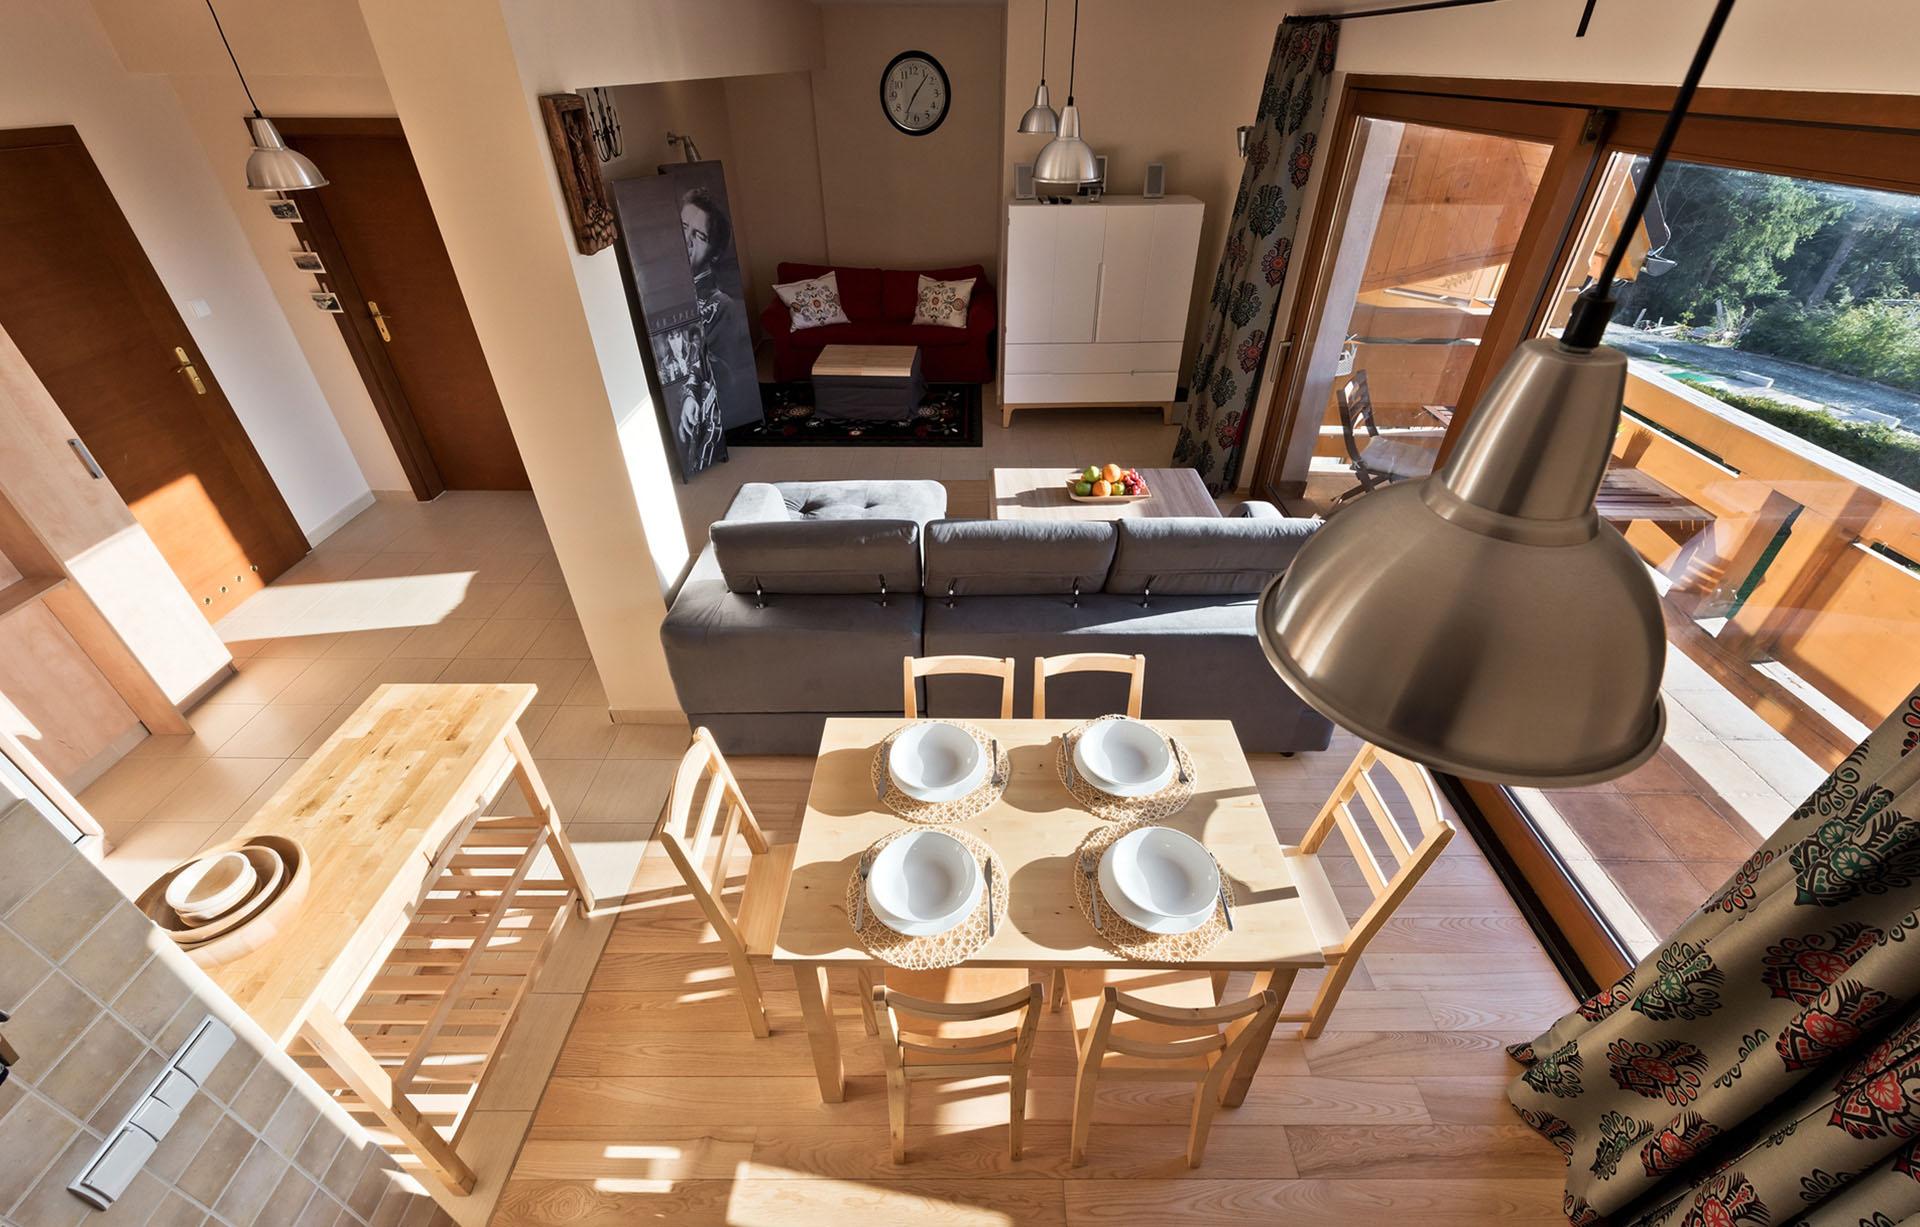 Apartament Sywarne Deluxe - Samodzielne Apartamenty